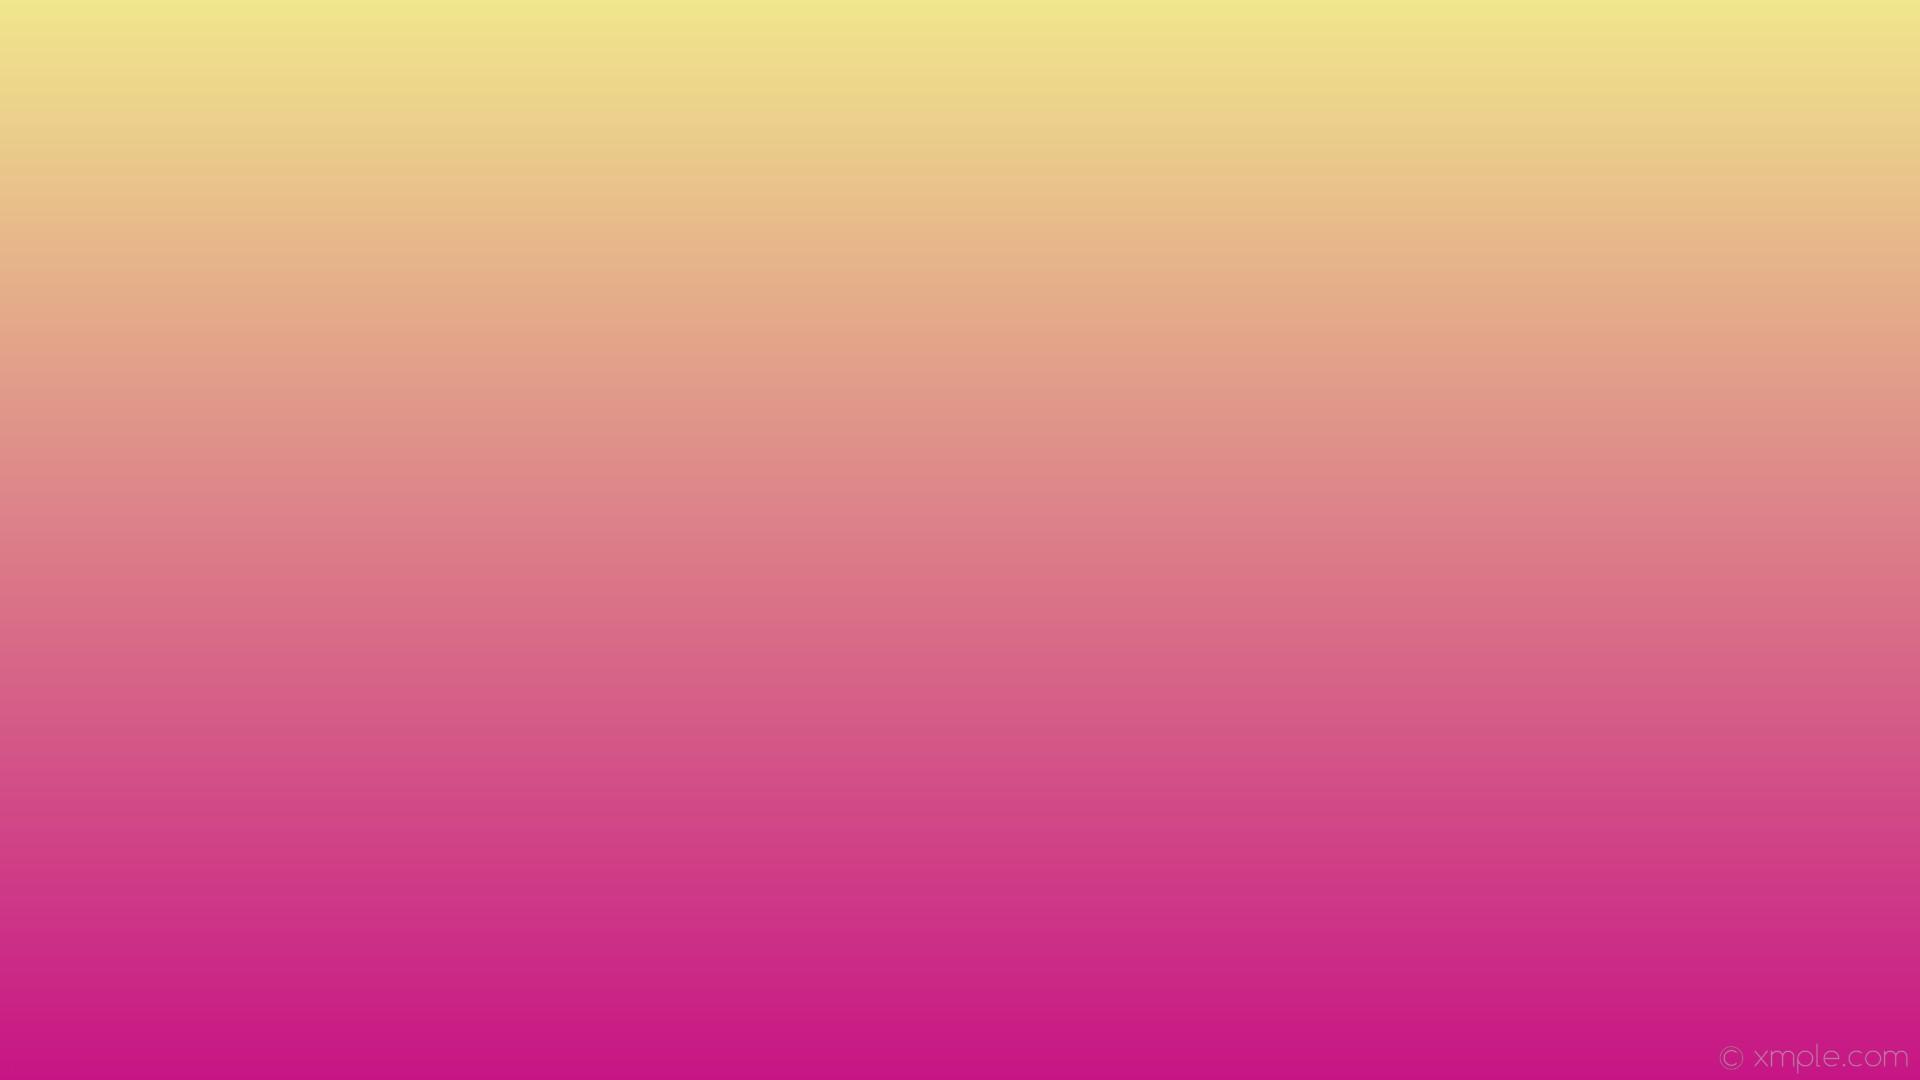 wallpaper linear yellow pink gradient khaki medium violet red #f0e68c  #c71585 90°